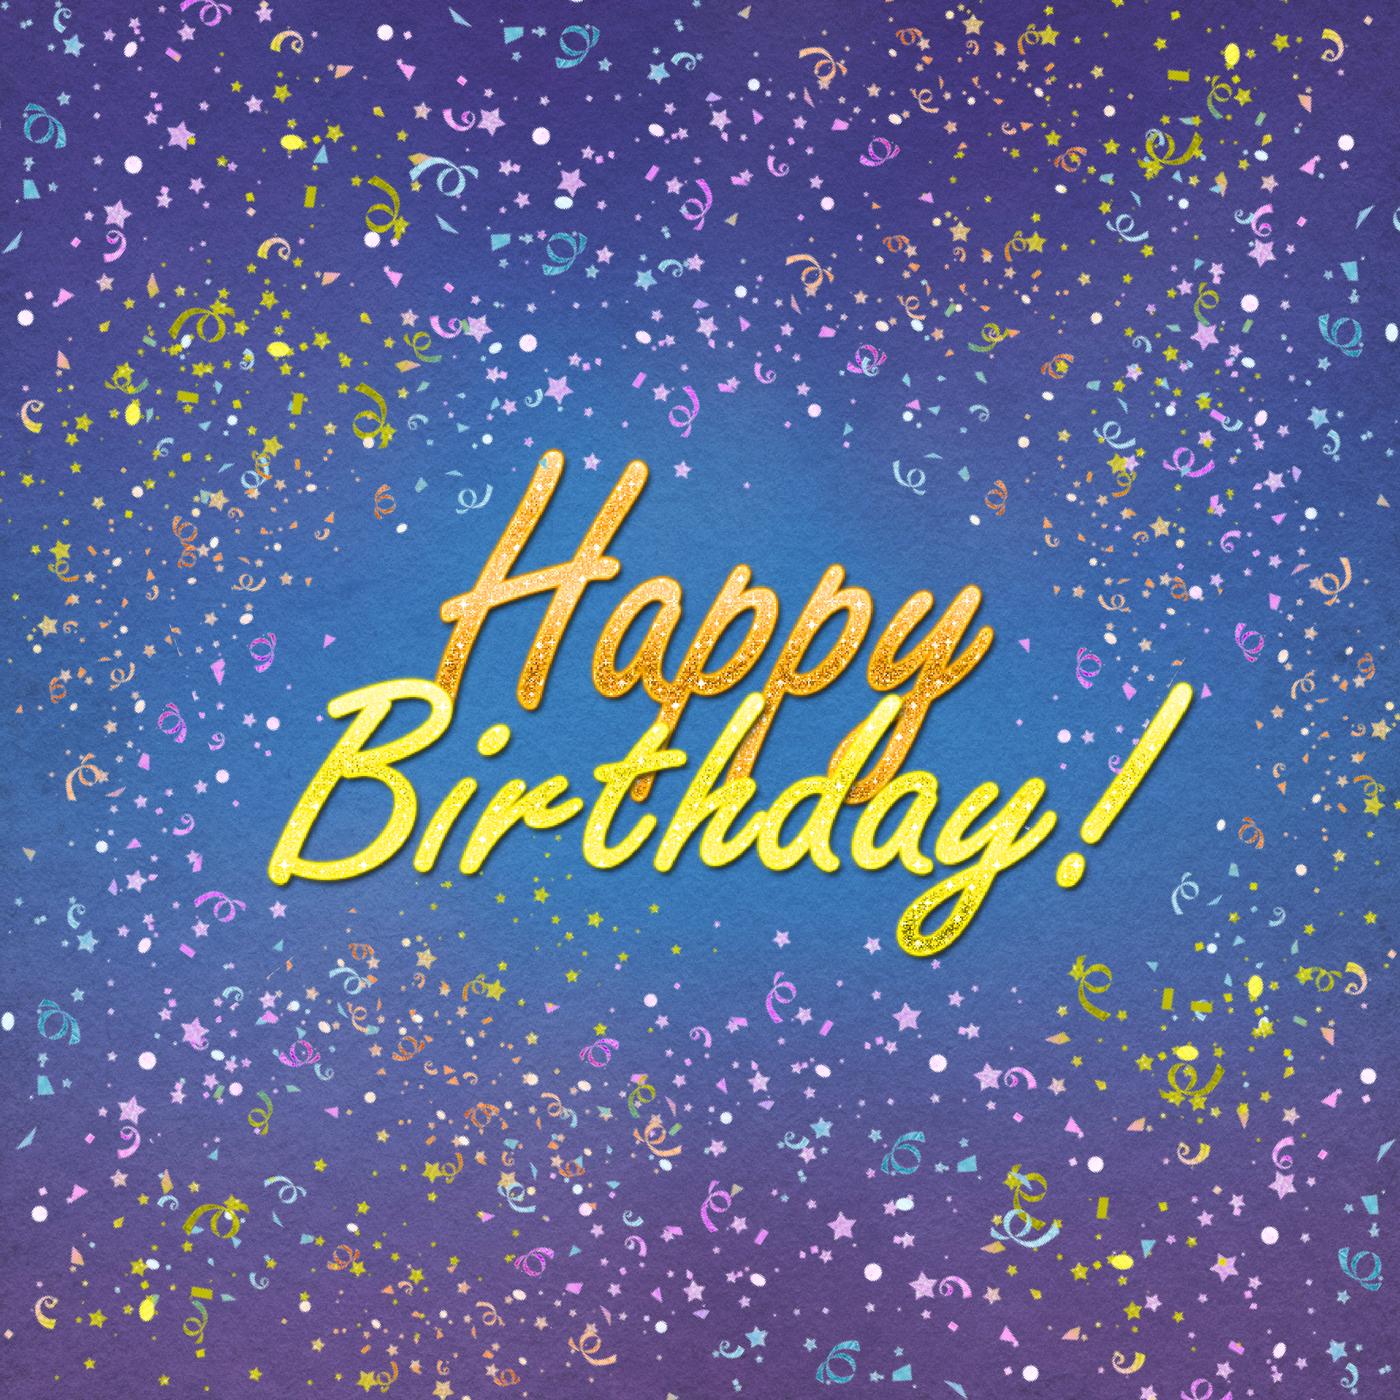 Happybirthday Happy Birthday Messages Birthday Greetings Happy Birthday Cards